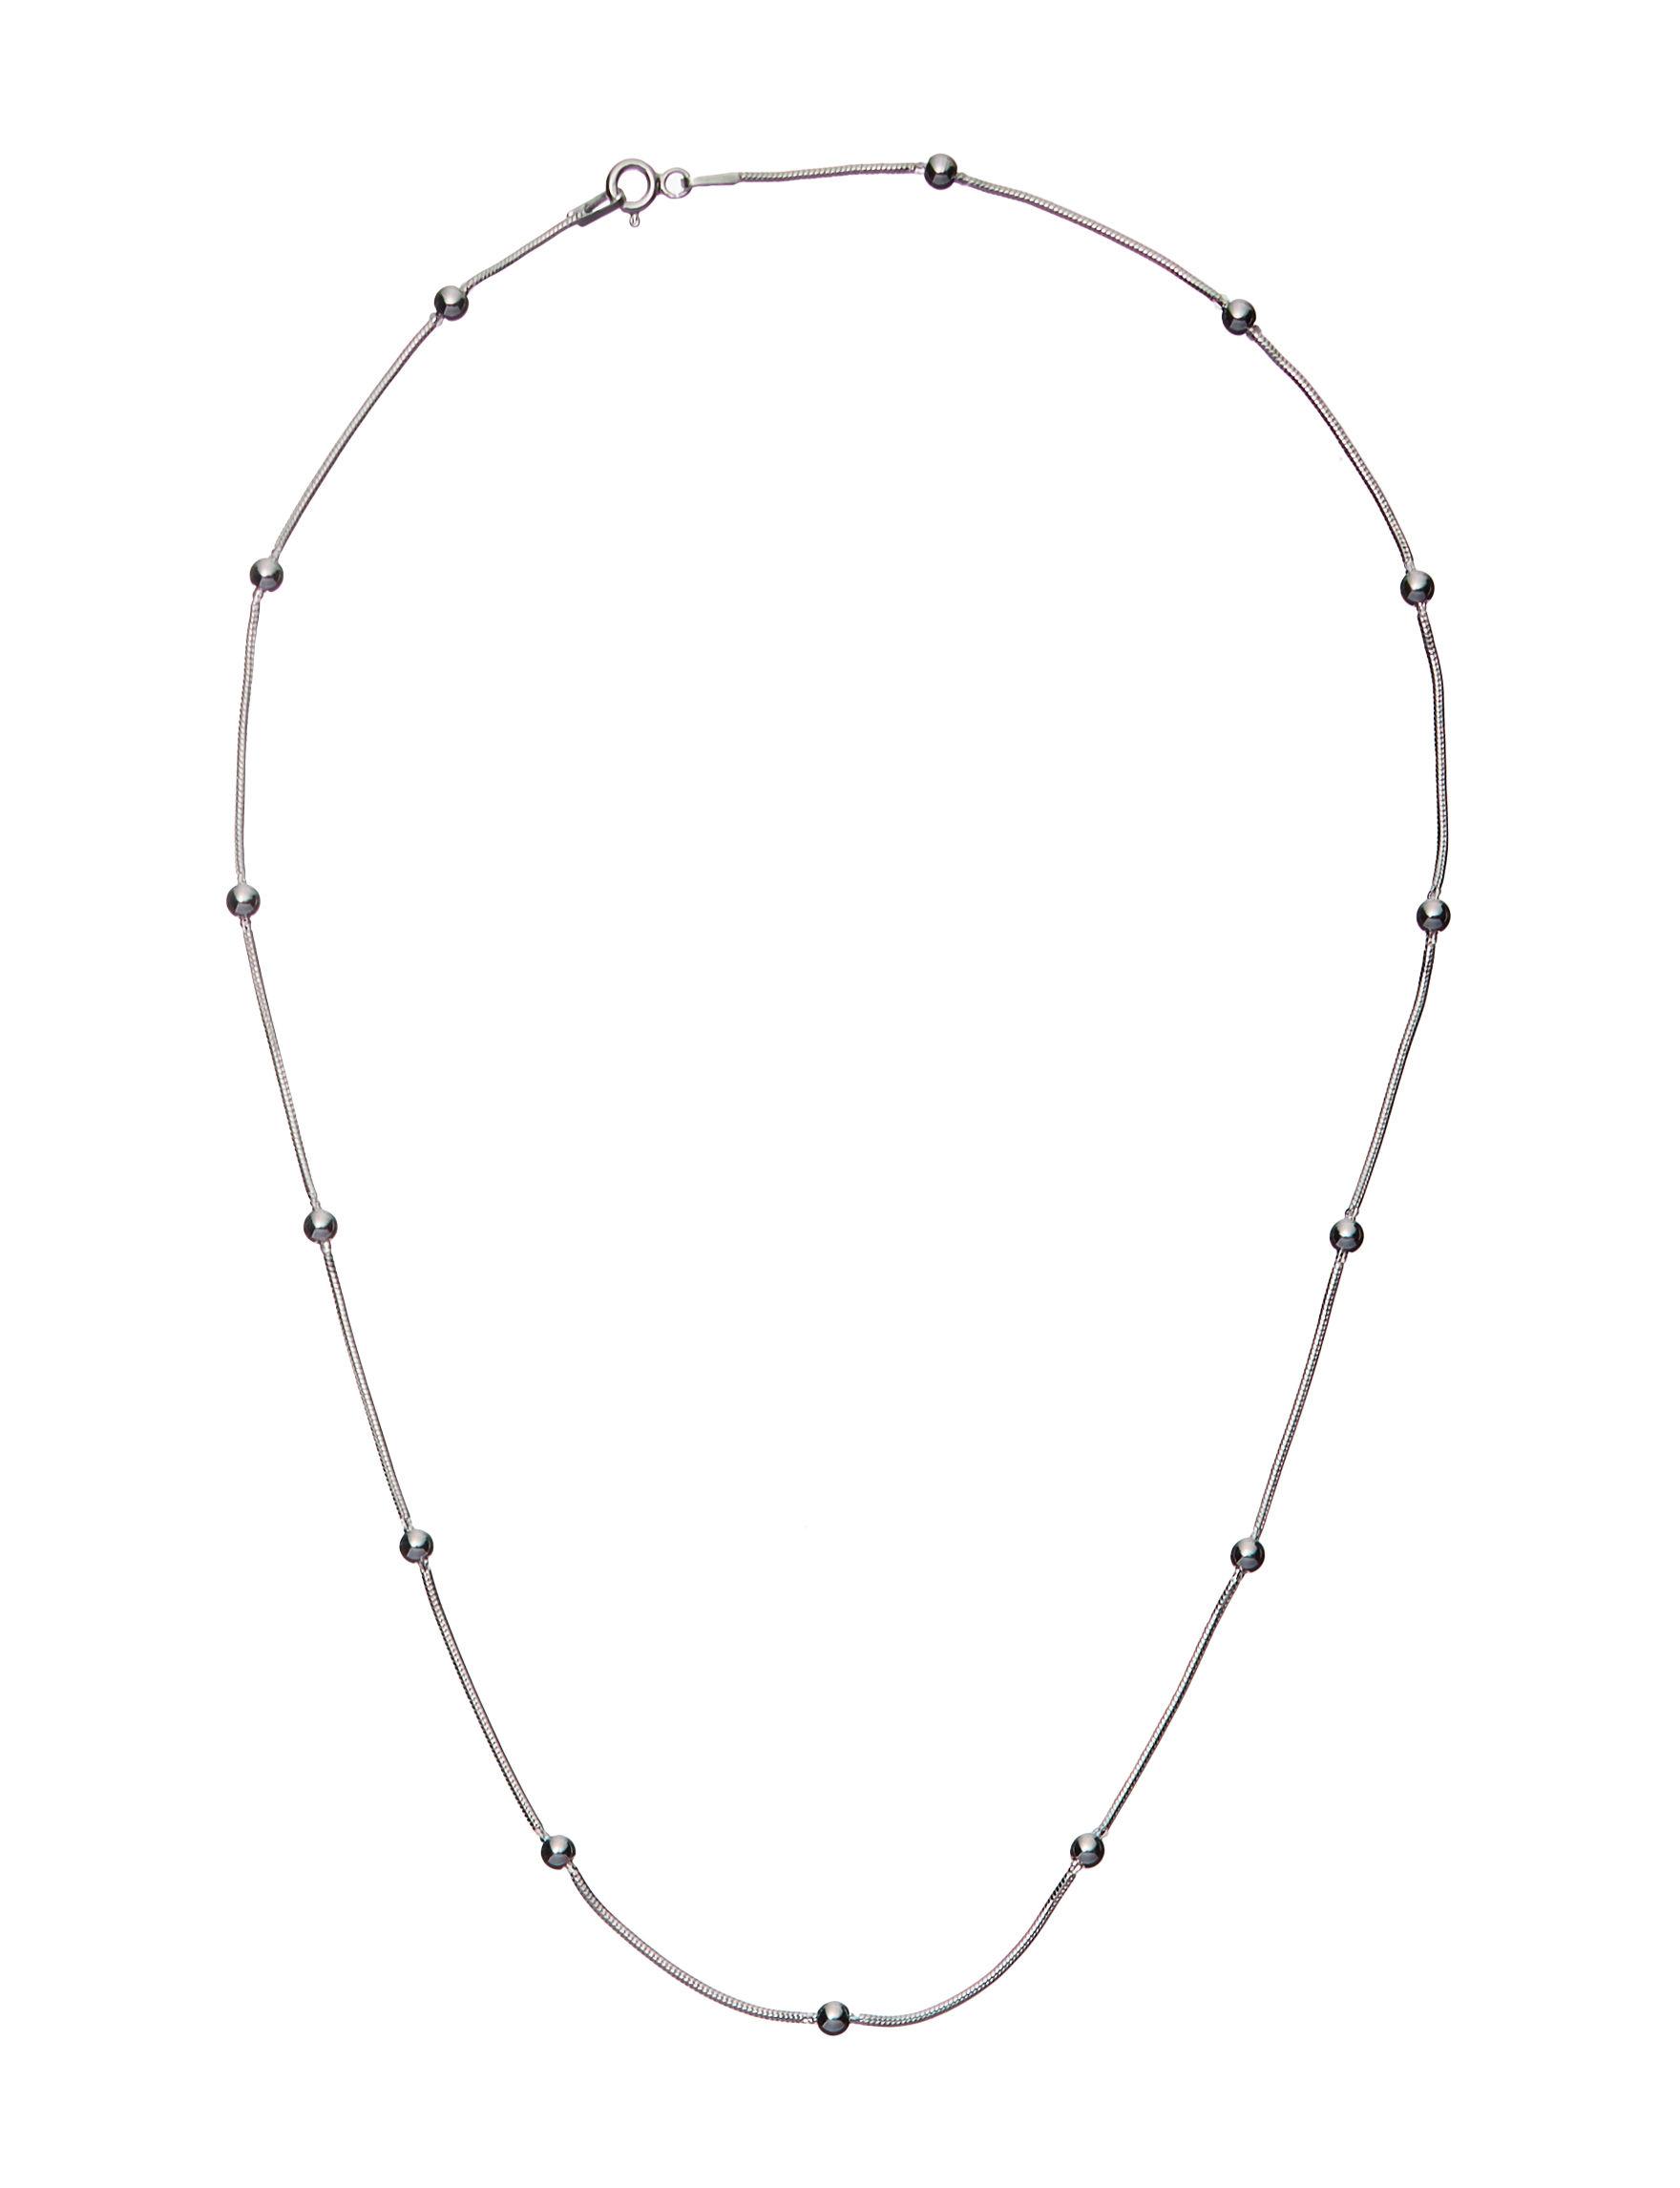 Danecraft Silver Necklaces & Pendants Fine Jewelry